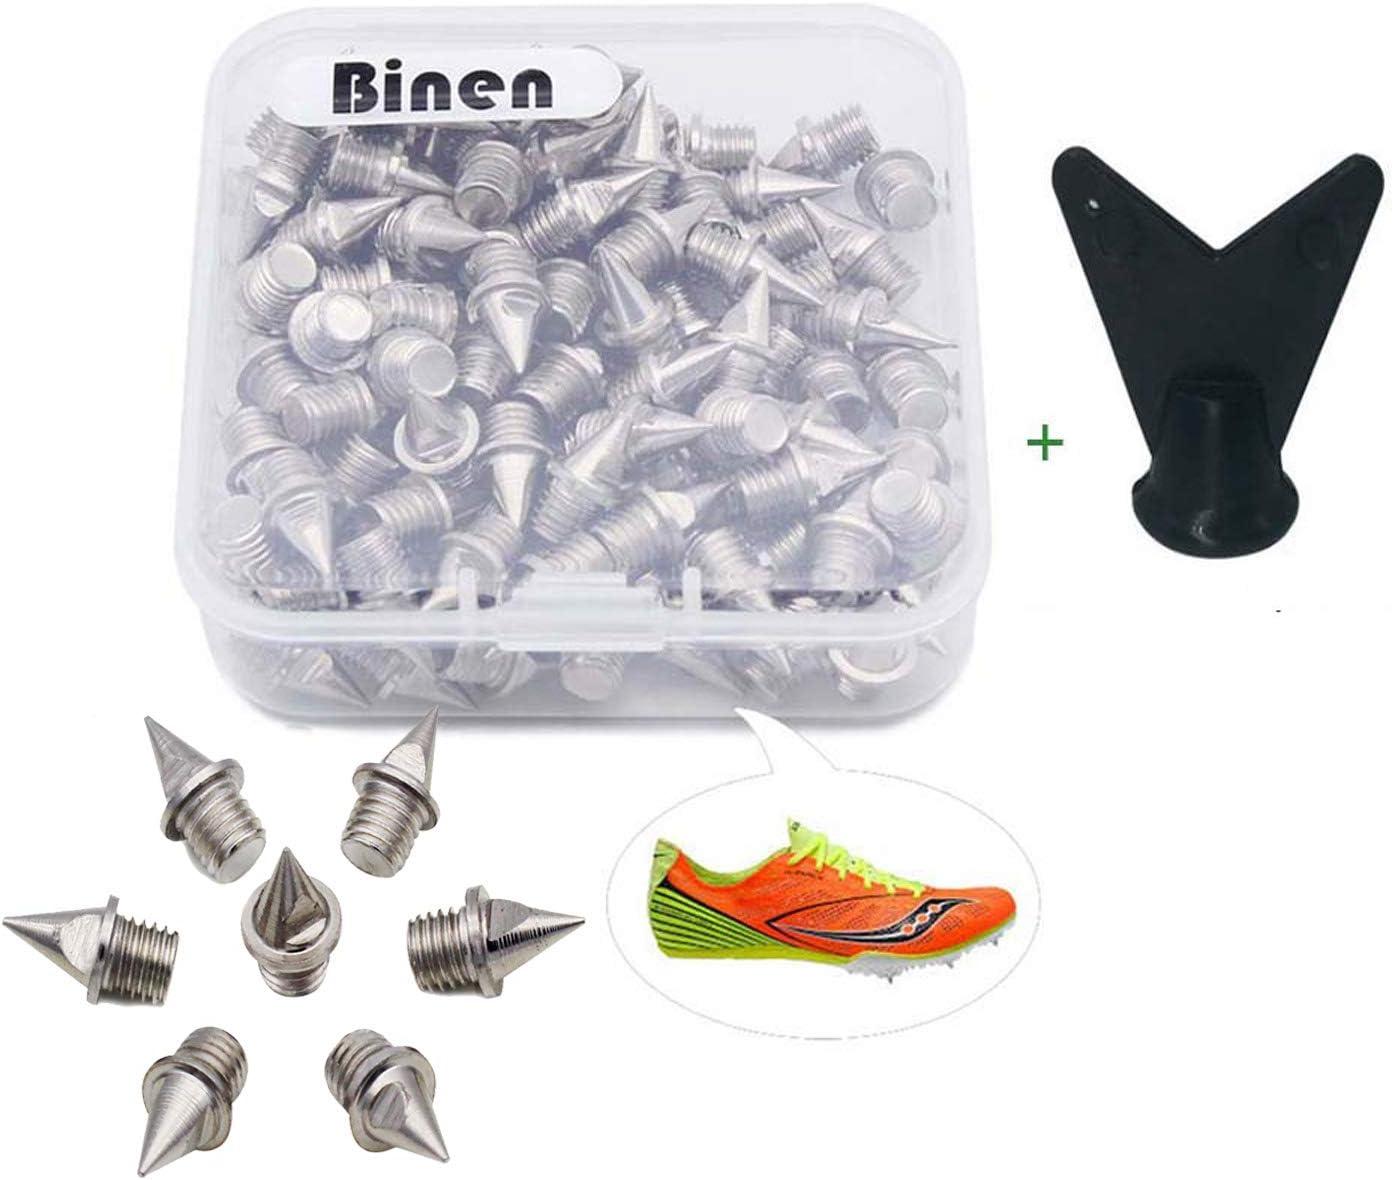 Amazon.com : Binen Track Spikes 1/4